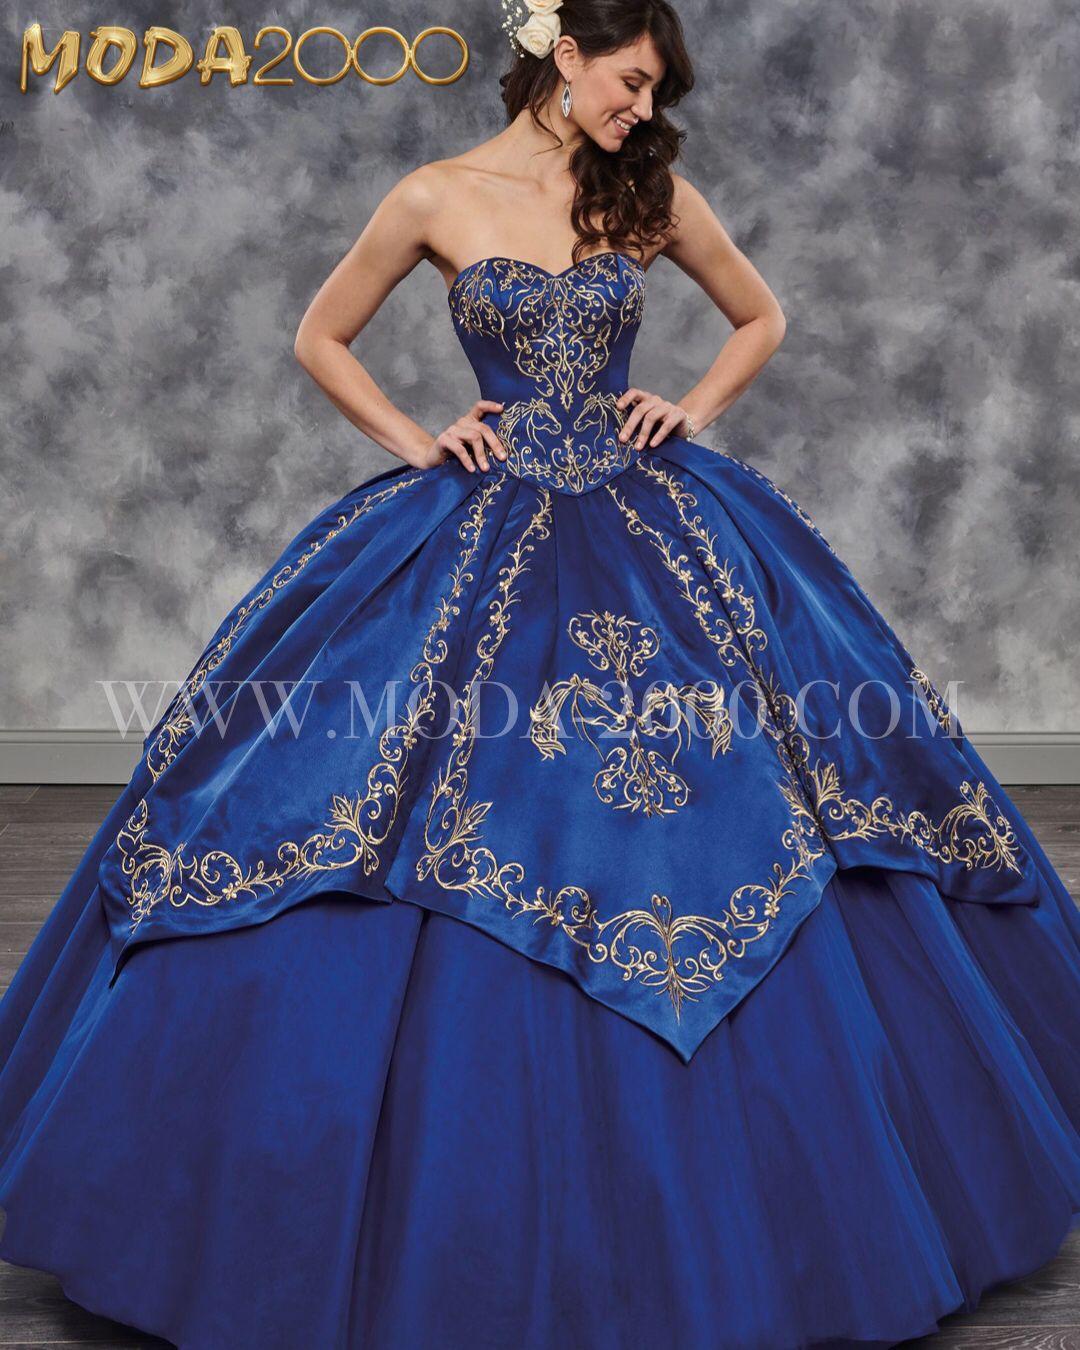 Royal Blue Charro Gold Quinceanera Dress Quinceanera Dresses Blue Mexican Quinceanera Dresses Quinceanera Dresses [ 1350 x 1080 Pixel ]